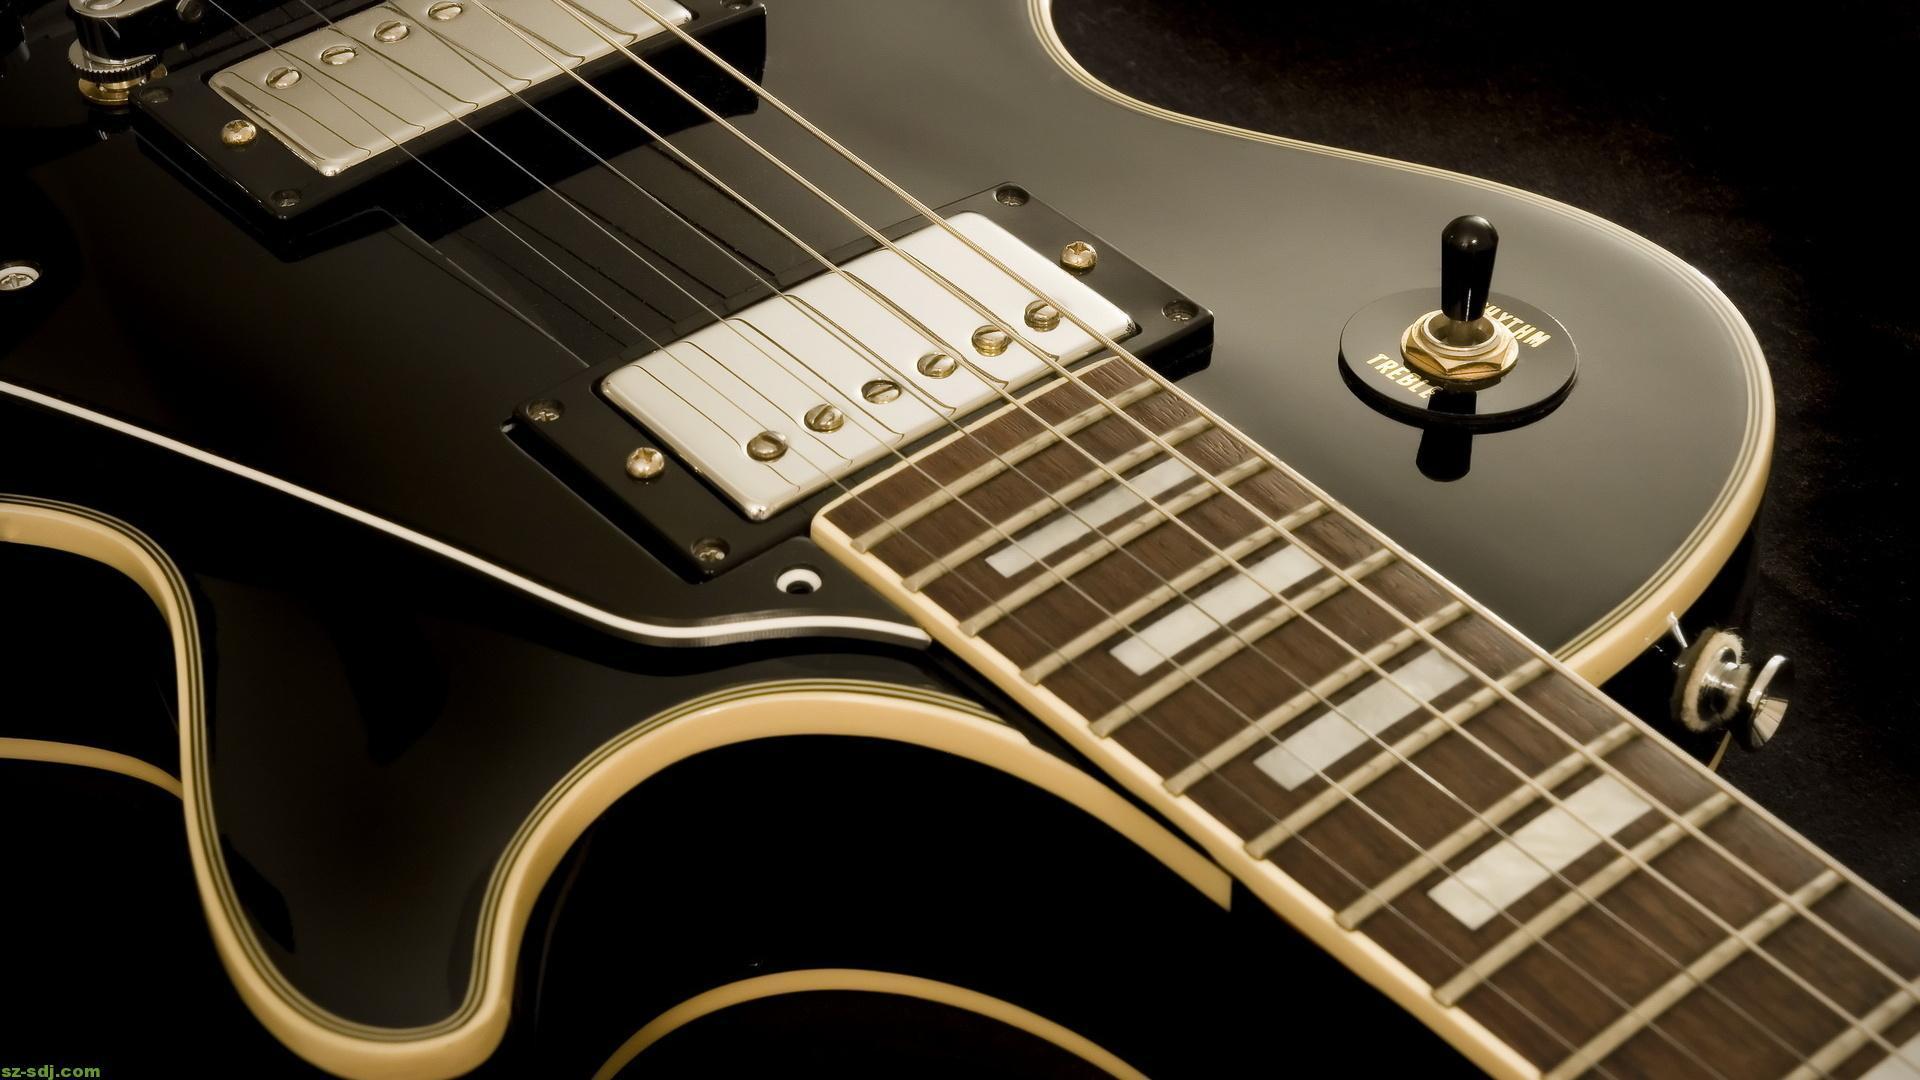 Hd wallpaper gitar - Fender Guitar Wallpaper Hd Fender Guitars Backgrounds Fender